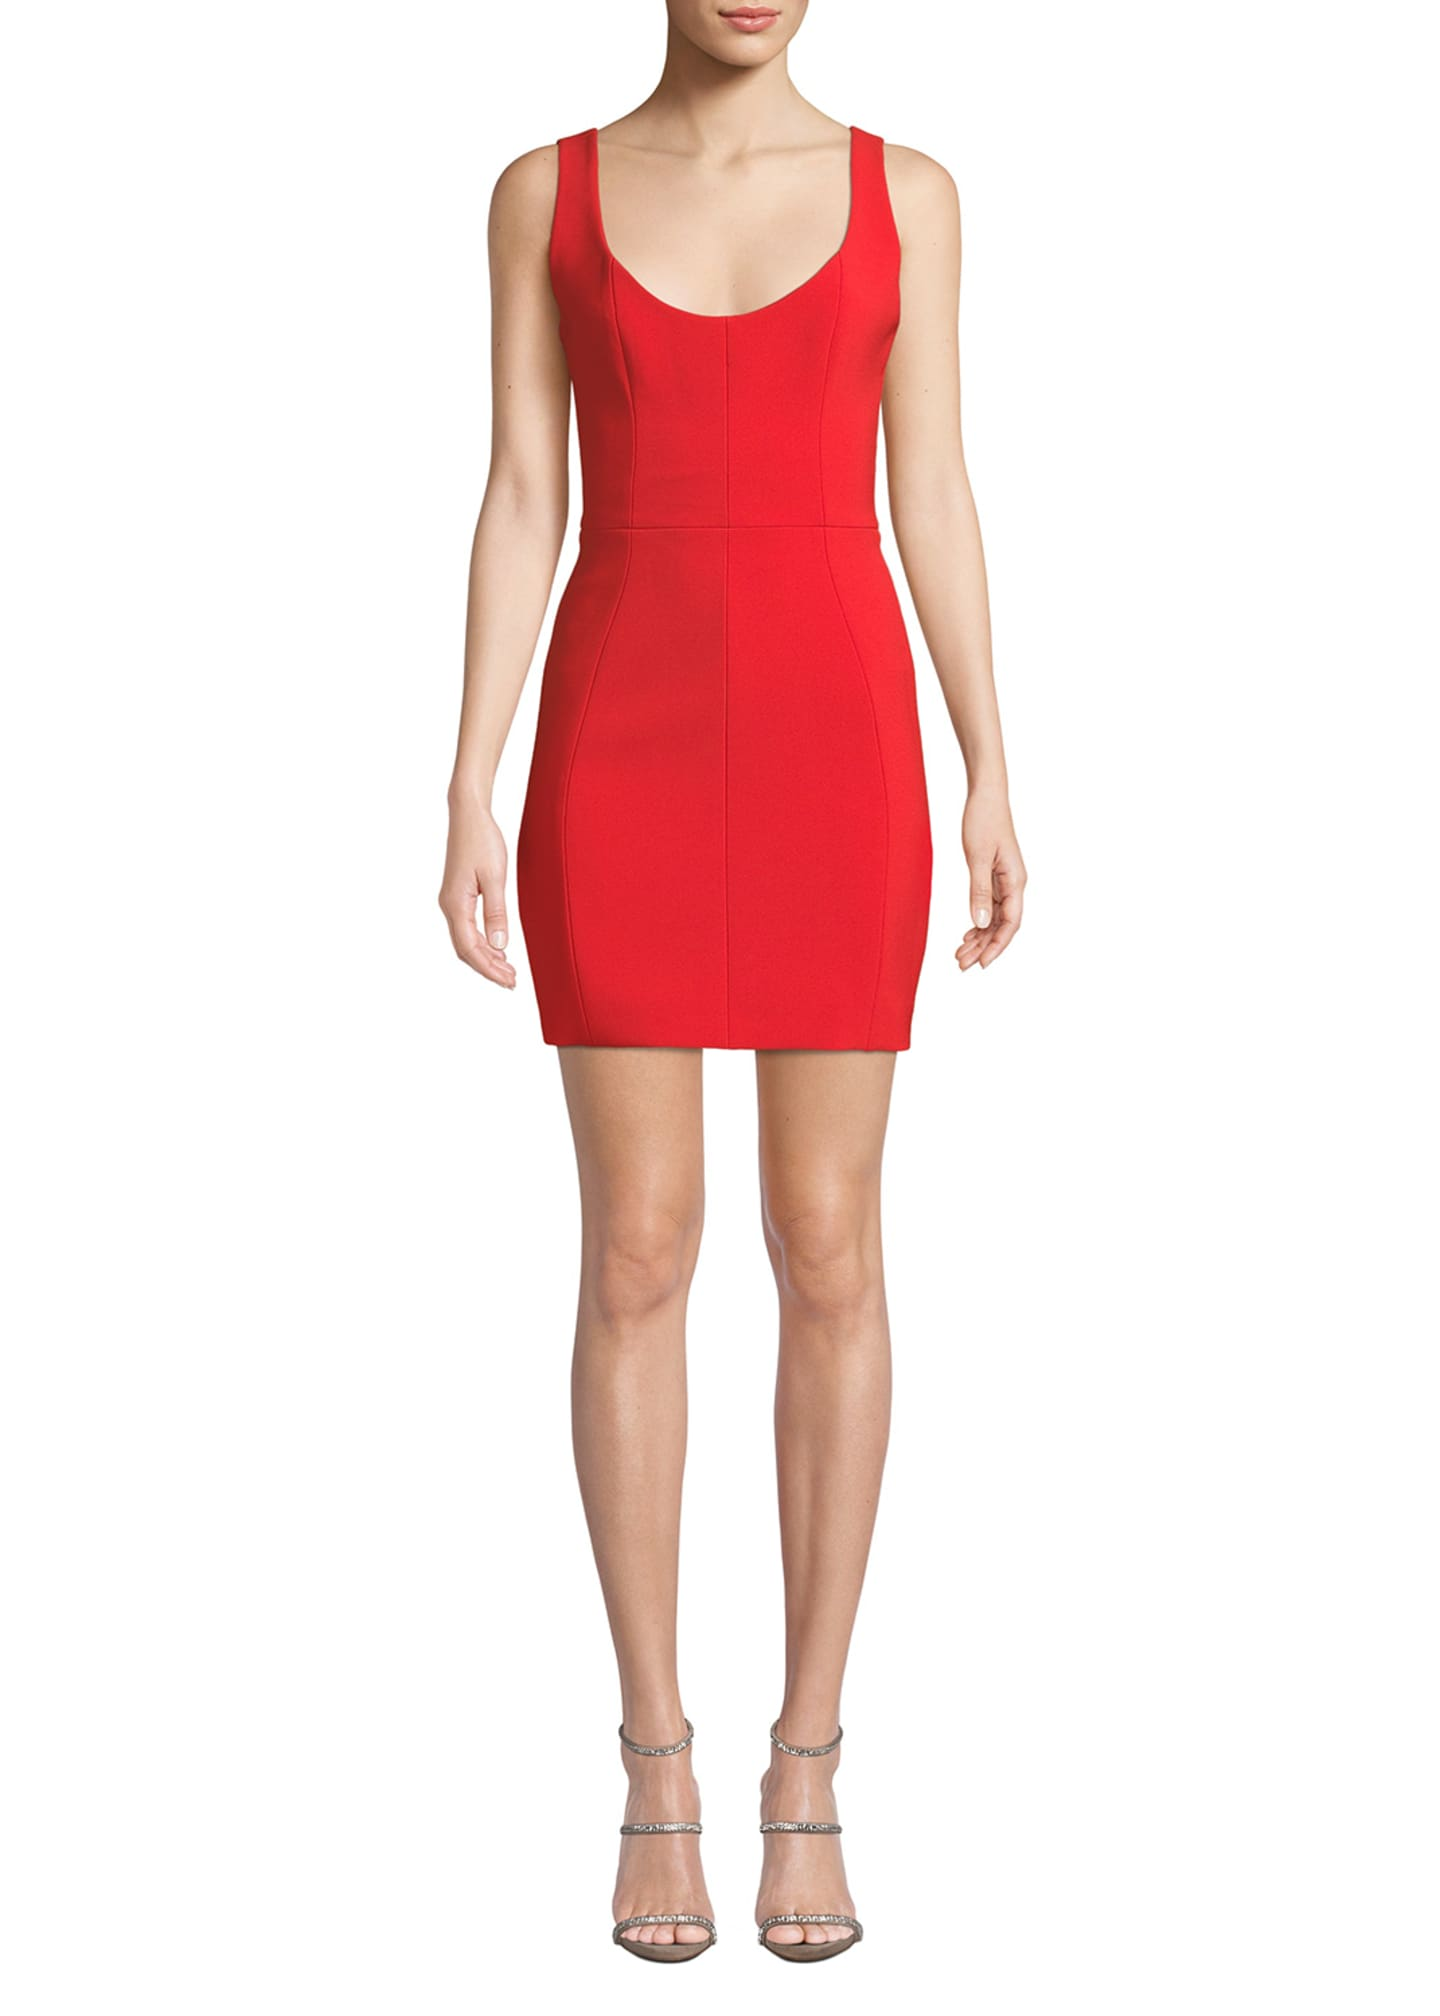 Carmen March Scoop-Neck Pique Body-Con Dress